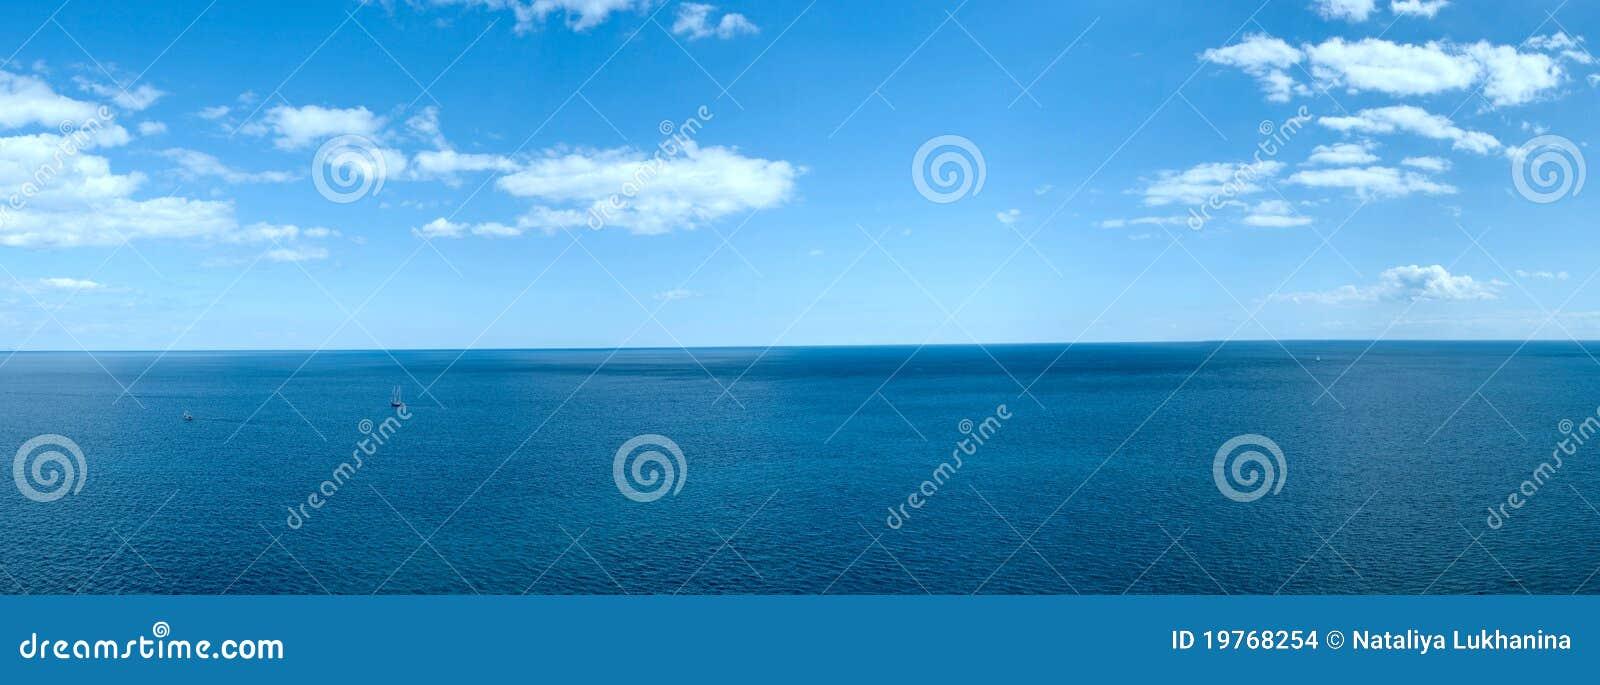 Panorama of a sea landscape